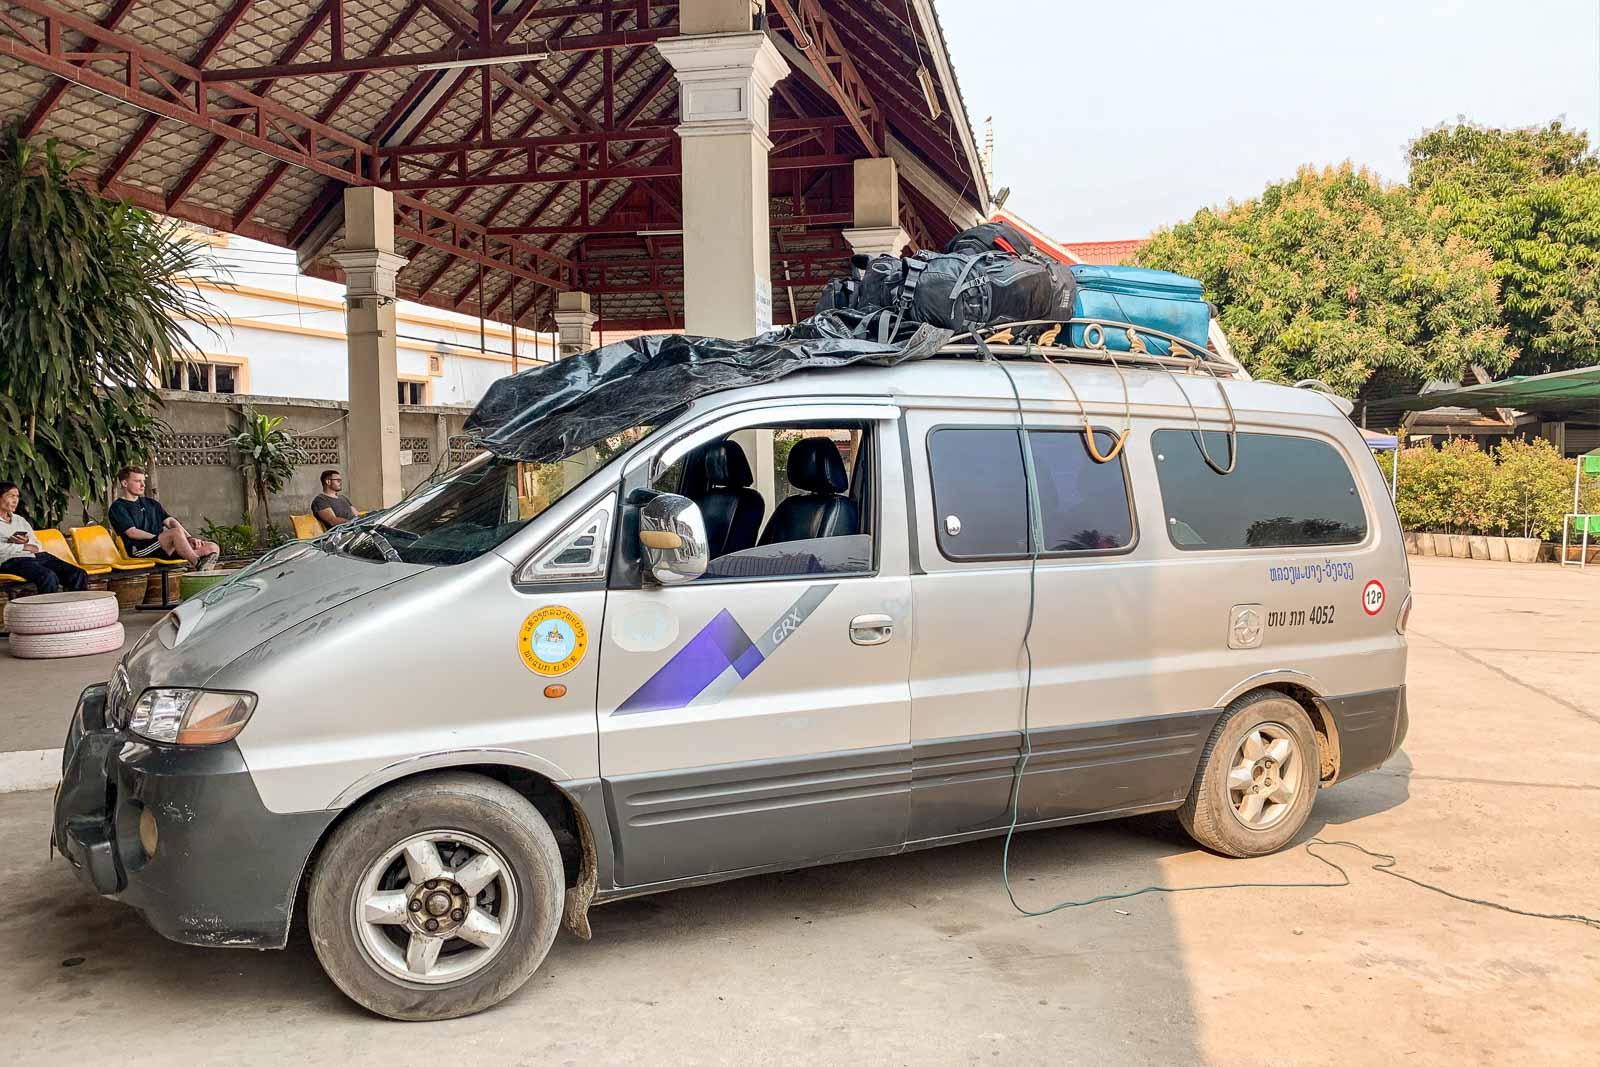 Traveling with a minivan from Luang Prabang to Vang Vieng